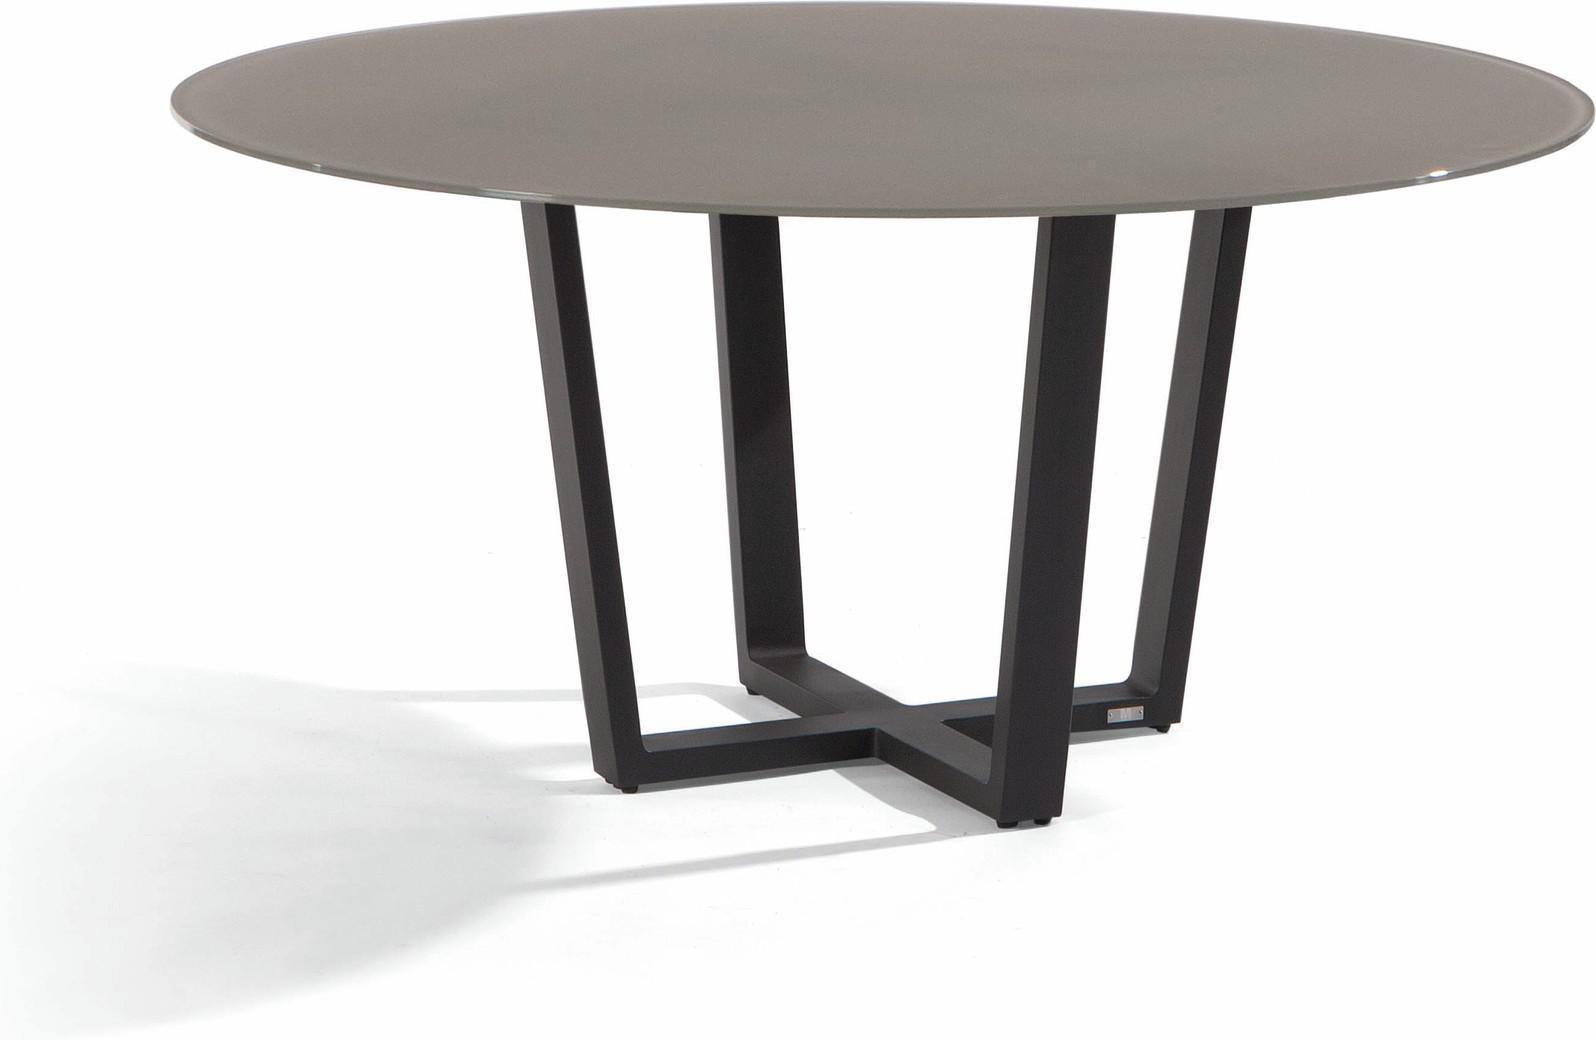 fuse-dining-table-lava-cf-148.jpg